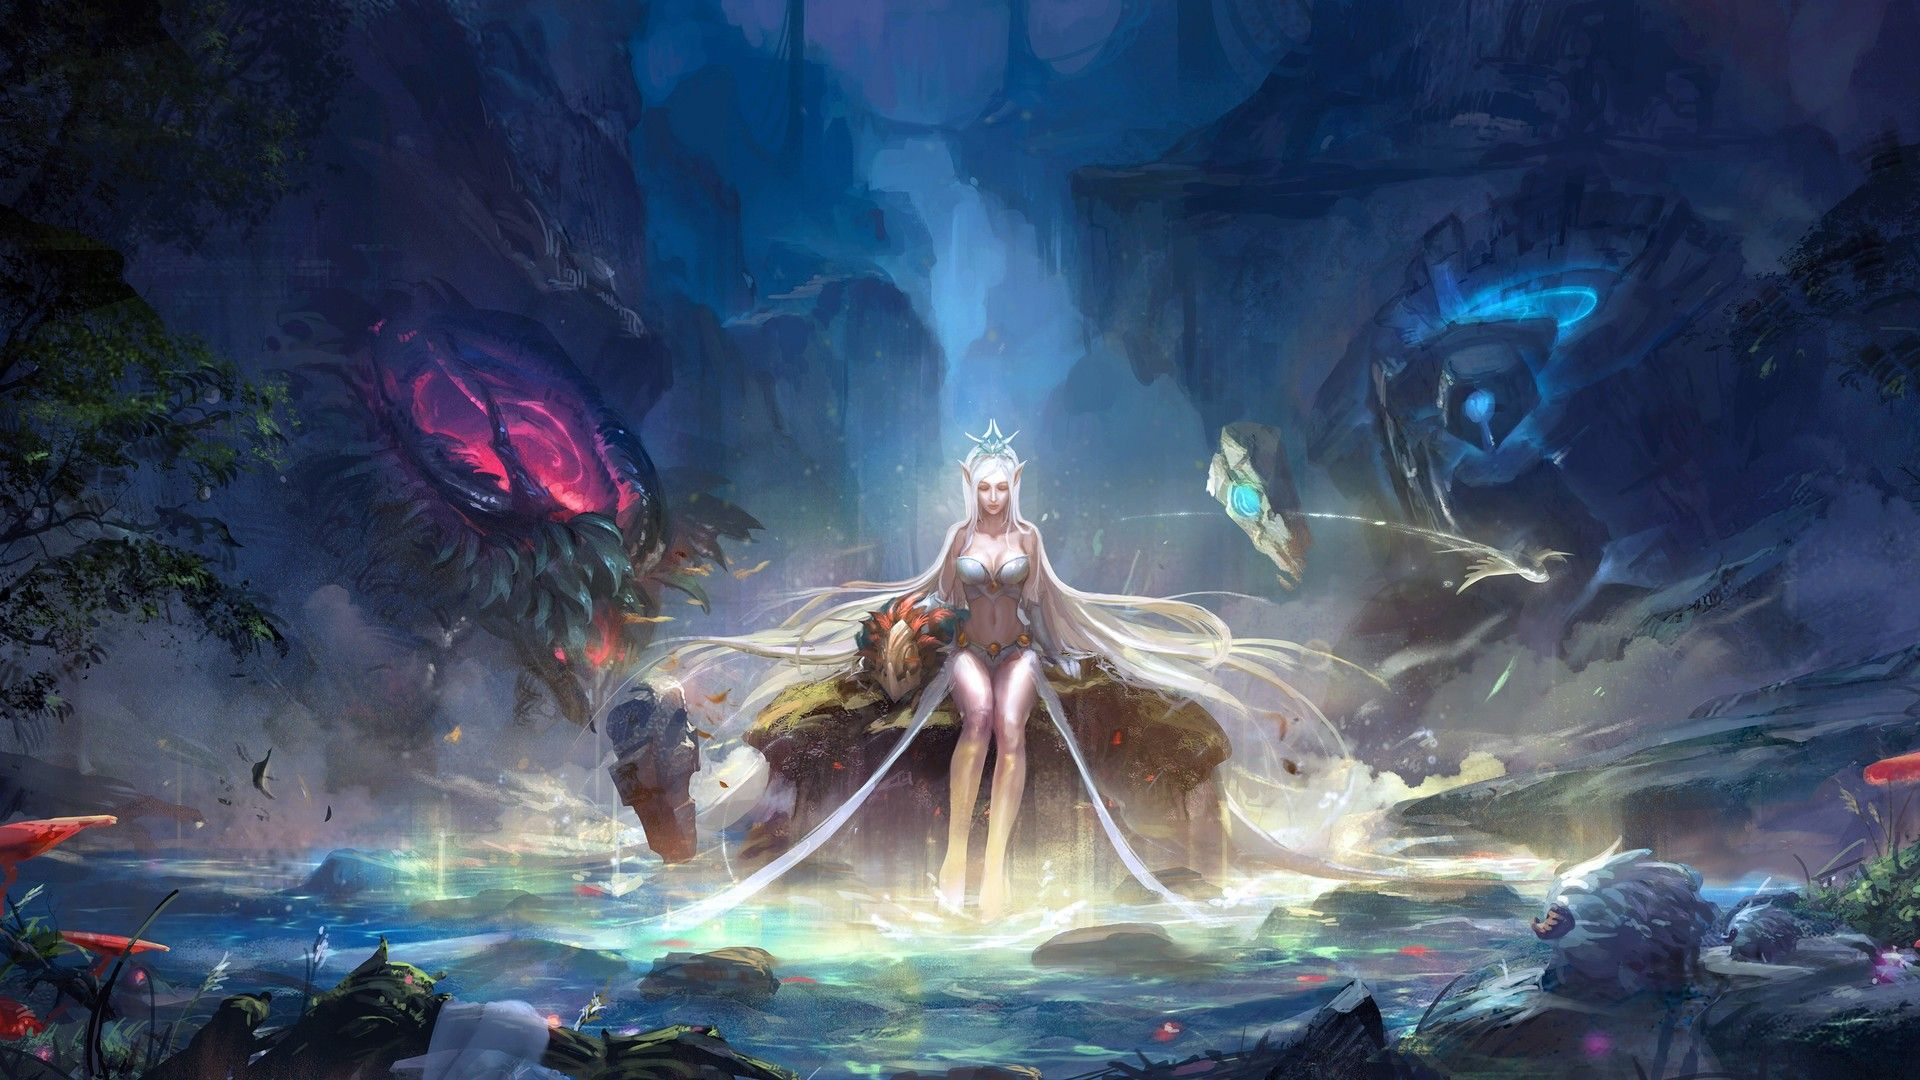 Download League Of Legends Hd Wallpaper In 1920x1080 Screen Resolution Lol League Of Legends League Of Legends Fantasy Girl